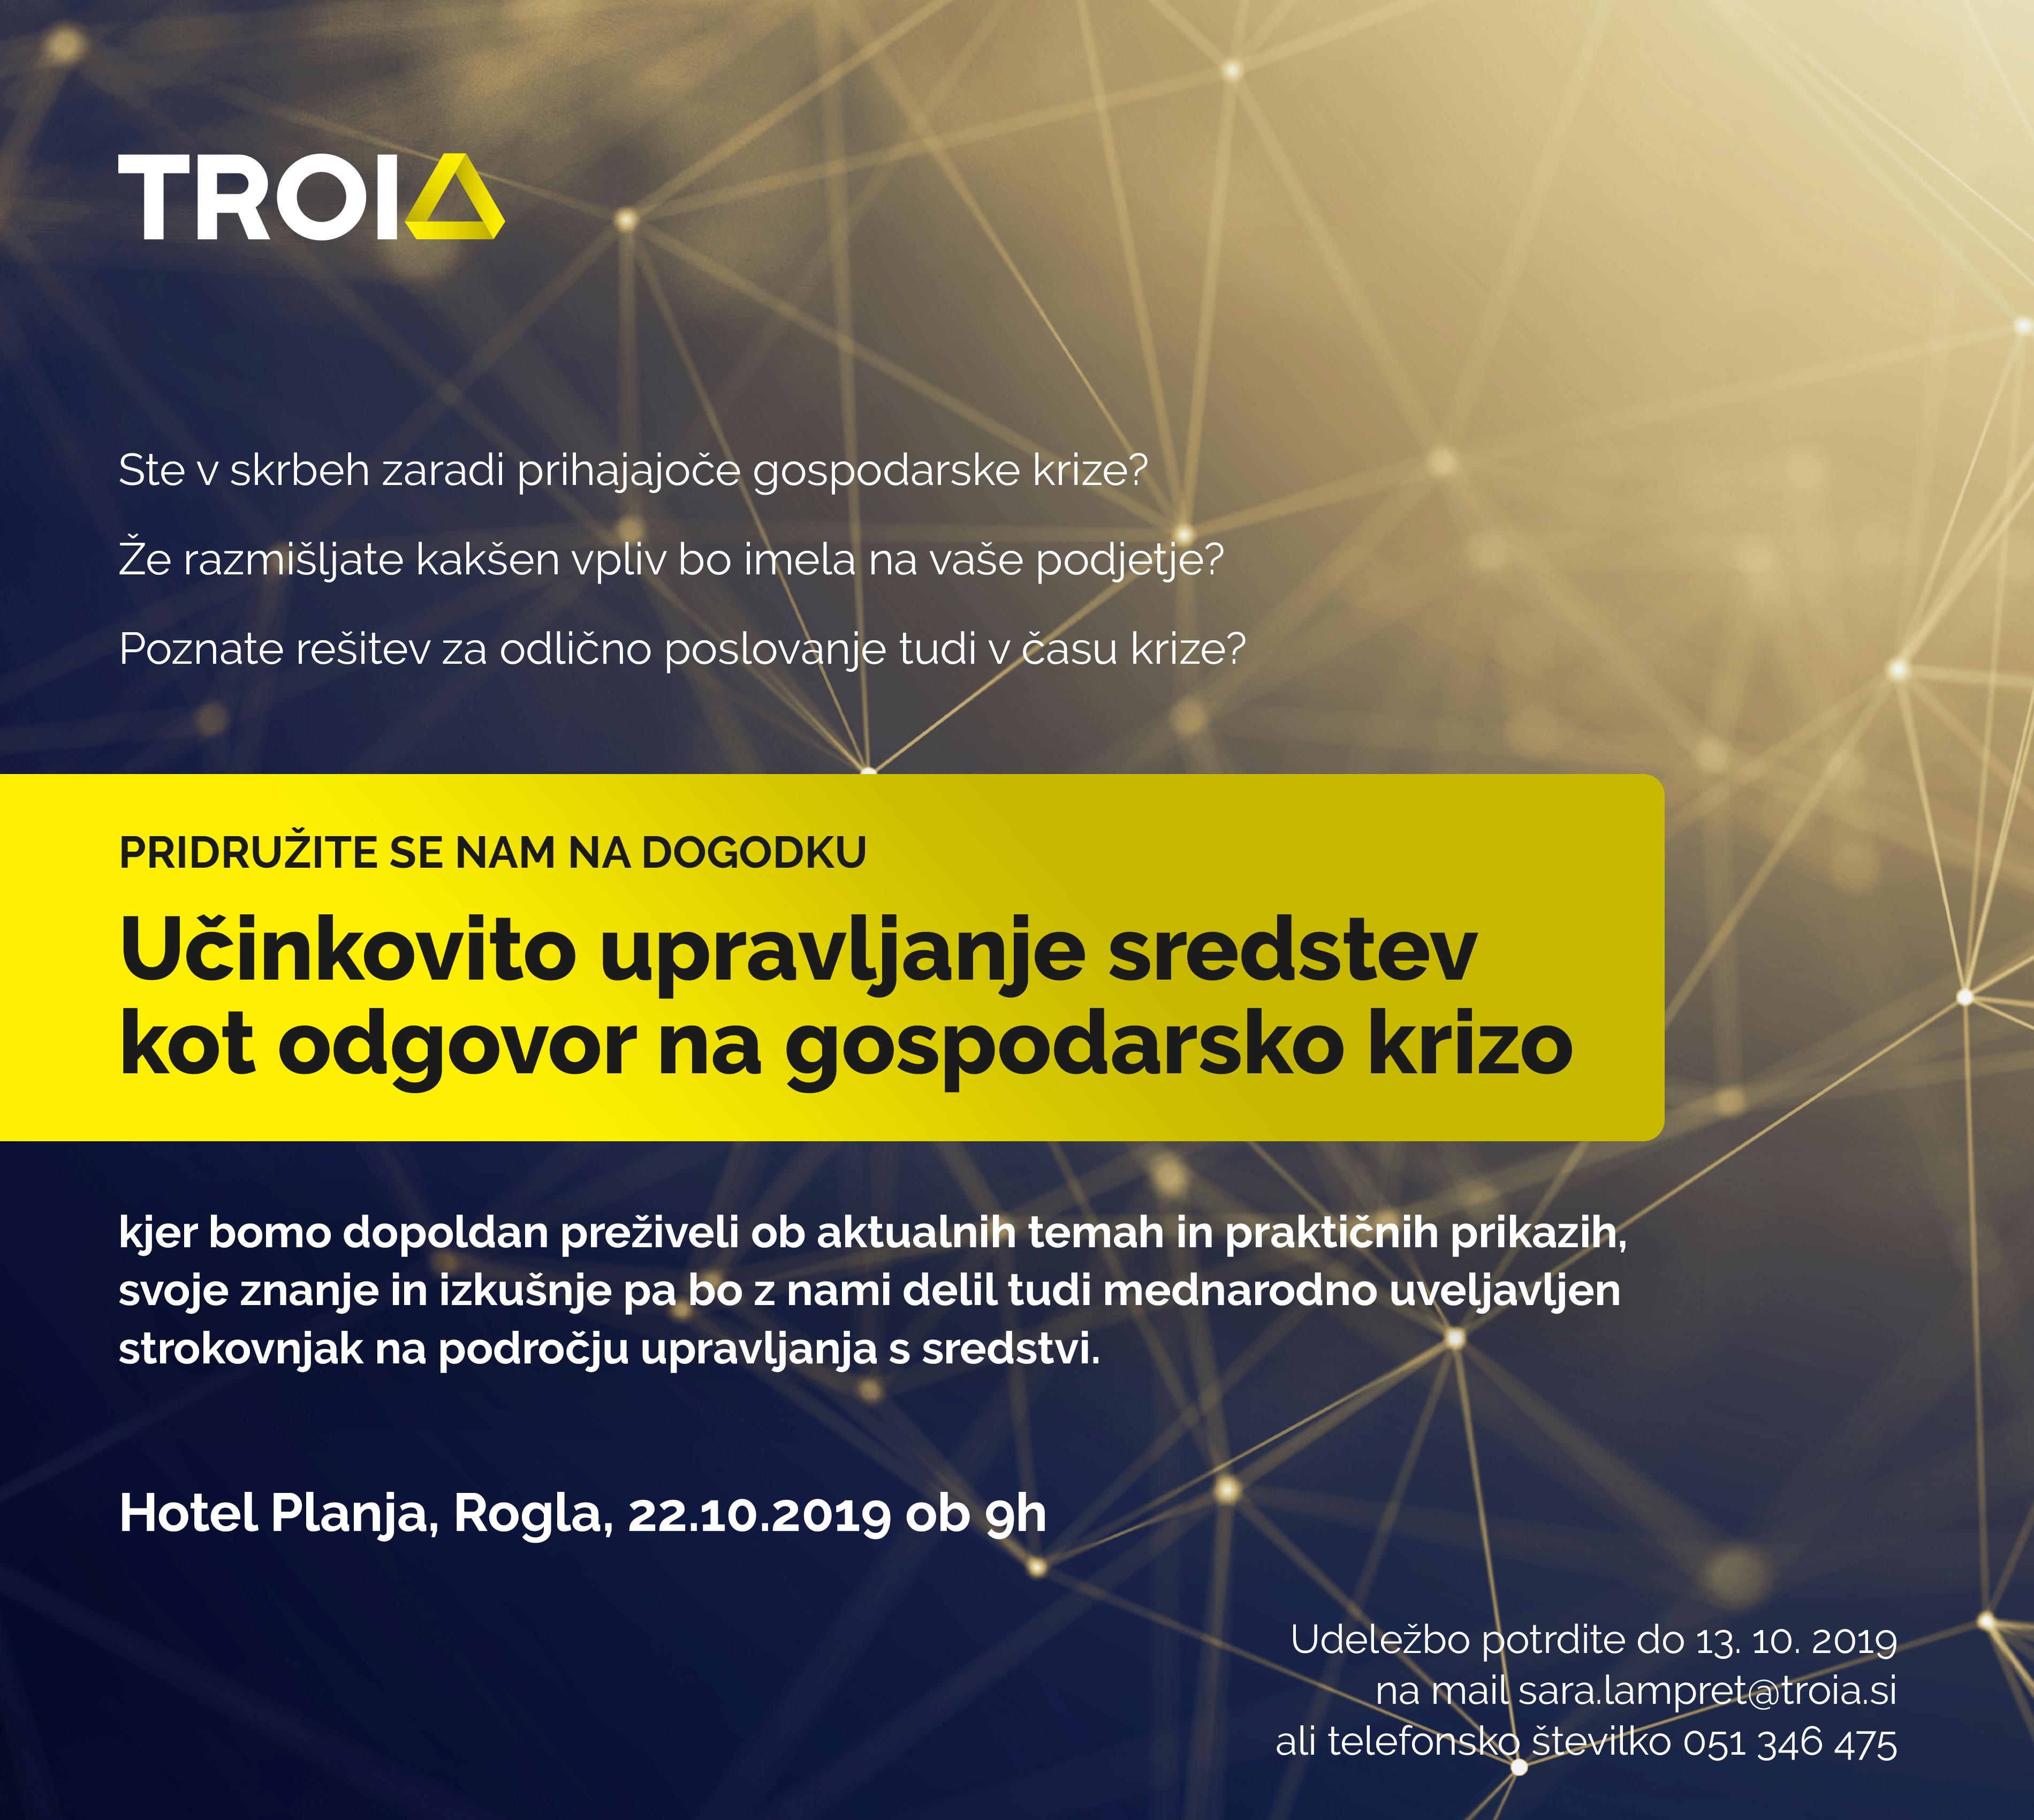 vabilo-troia-mailing-okt2019002.jpg